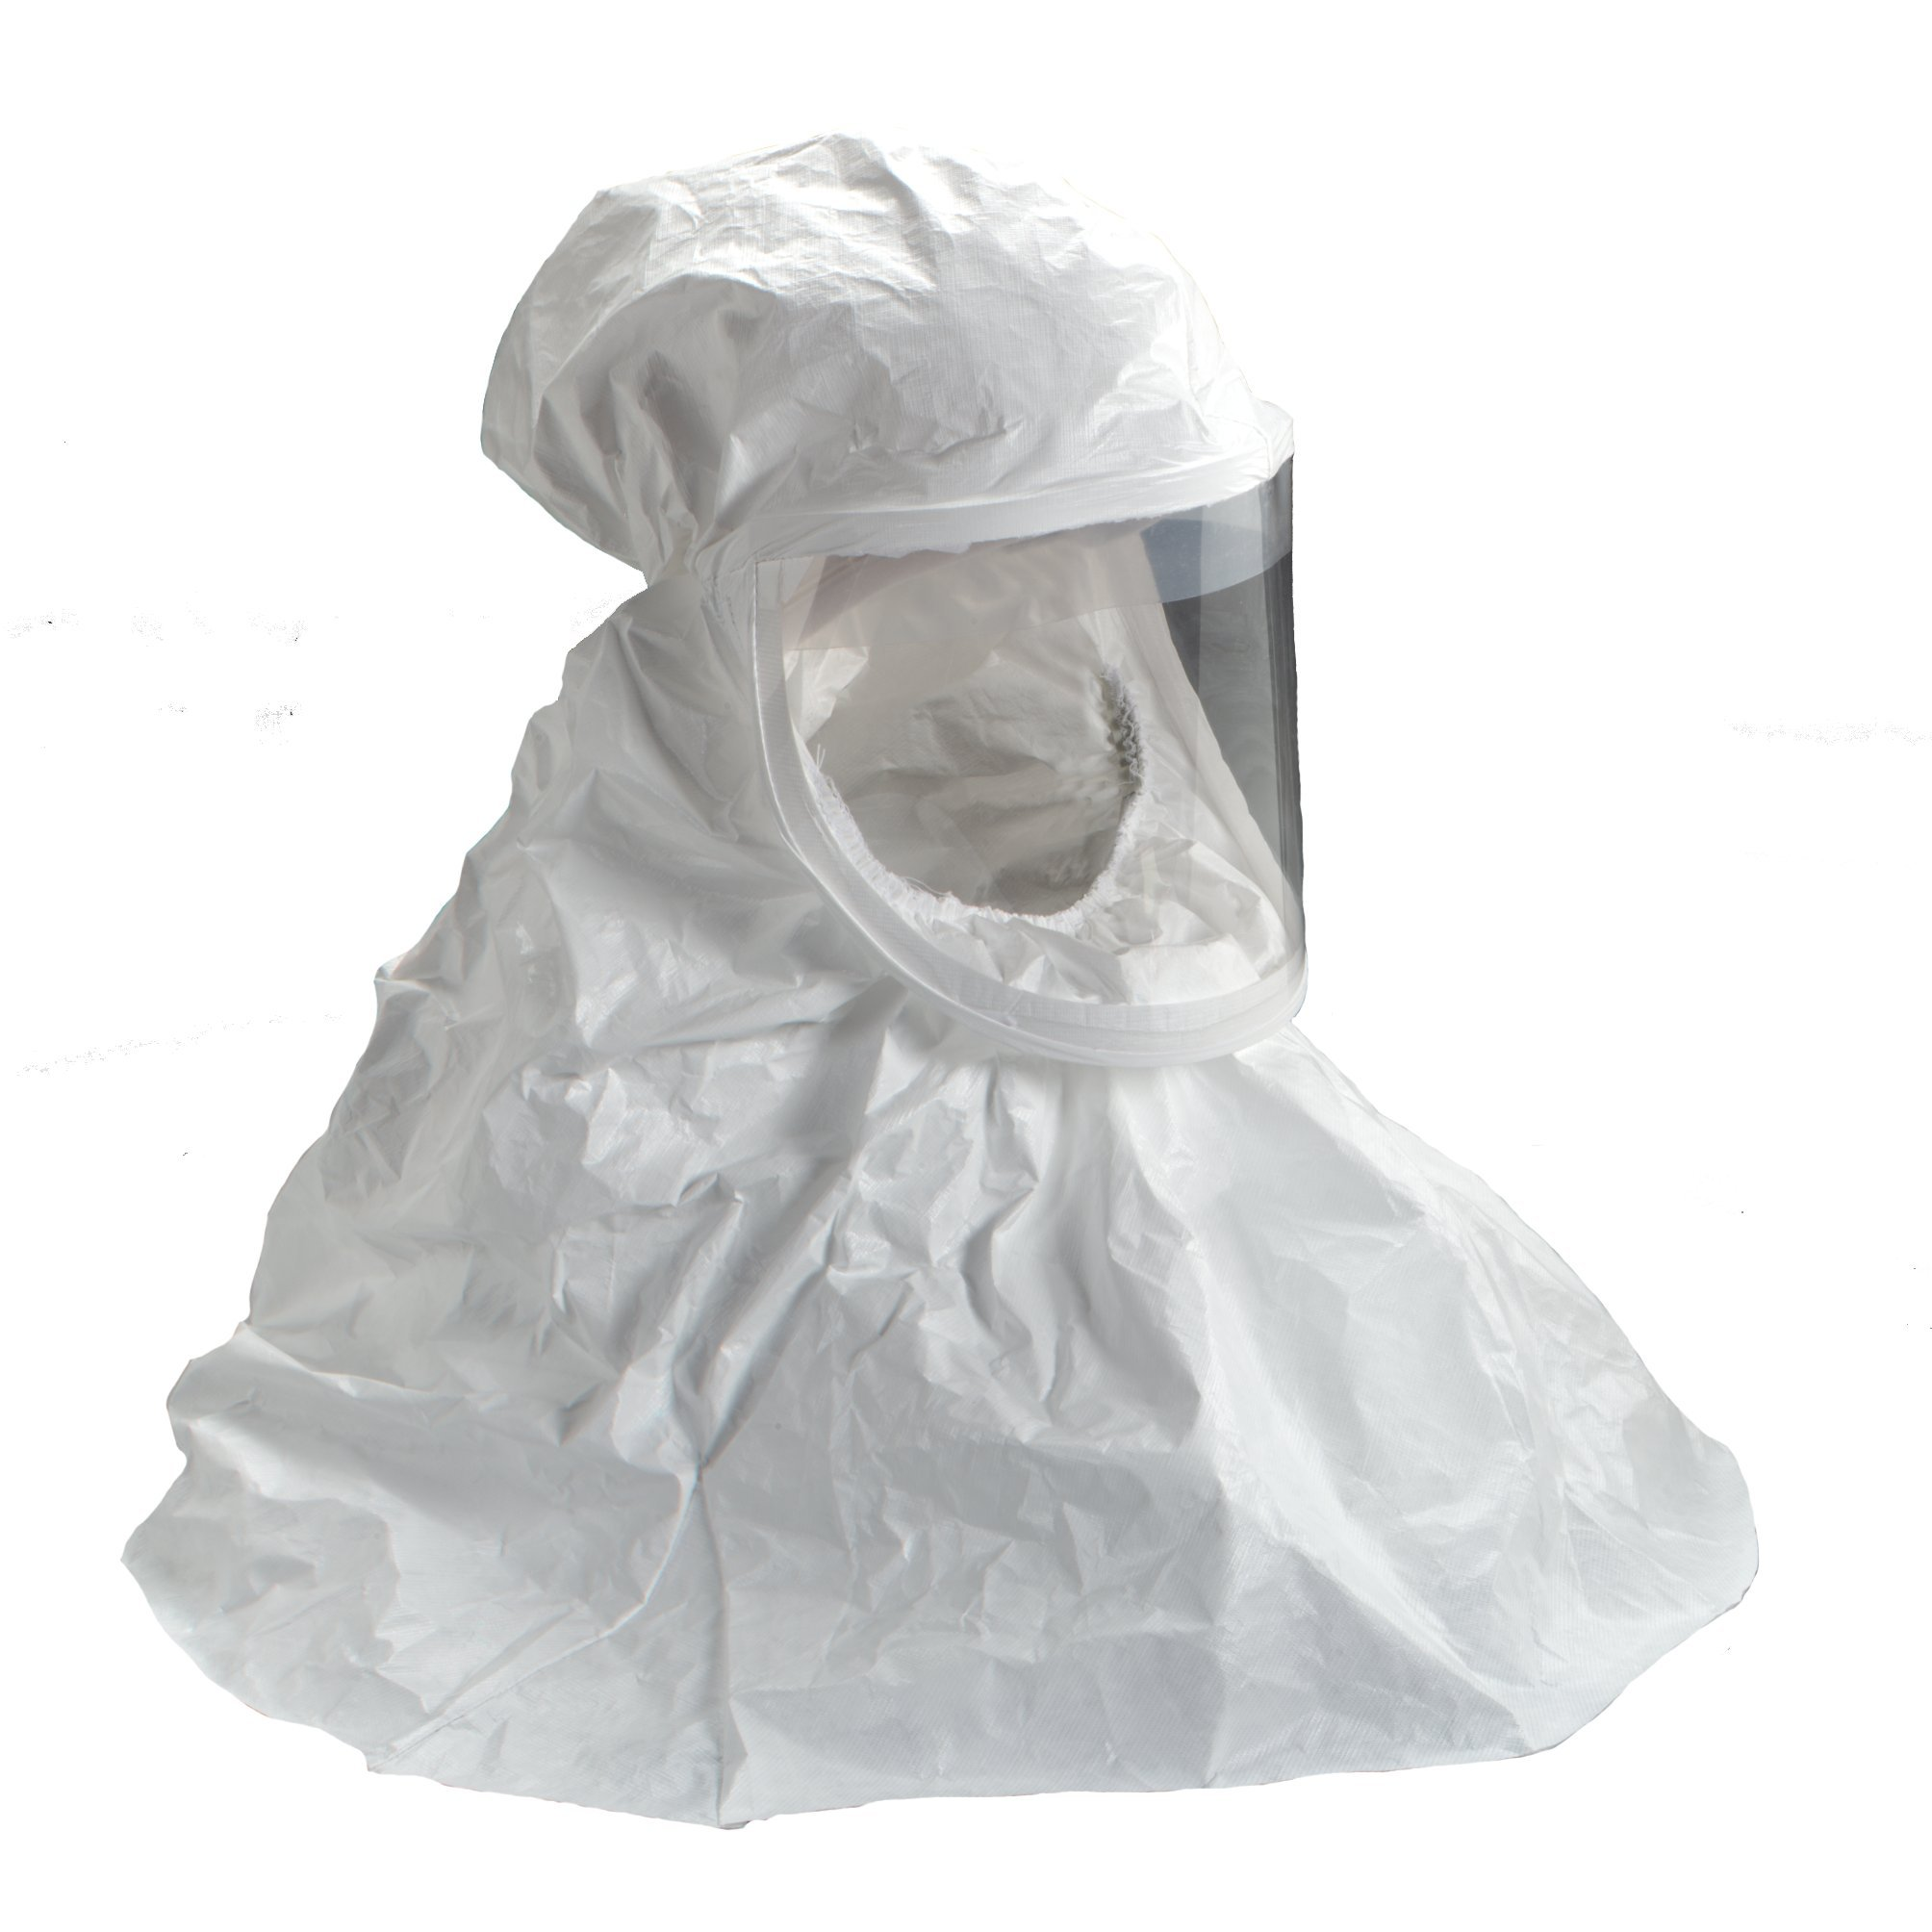 3M White Respirator Hood, Respiratory Protection BE-10-20, Regular (Case of 20)